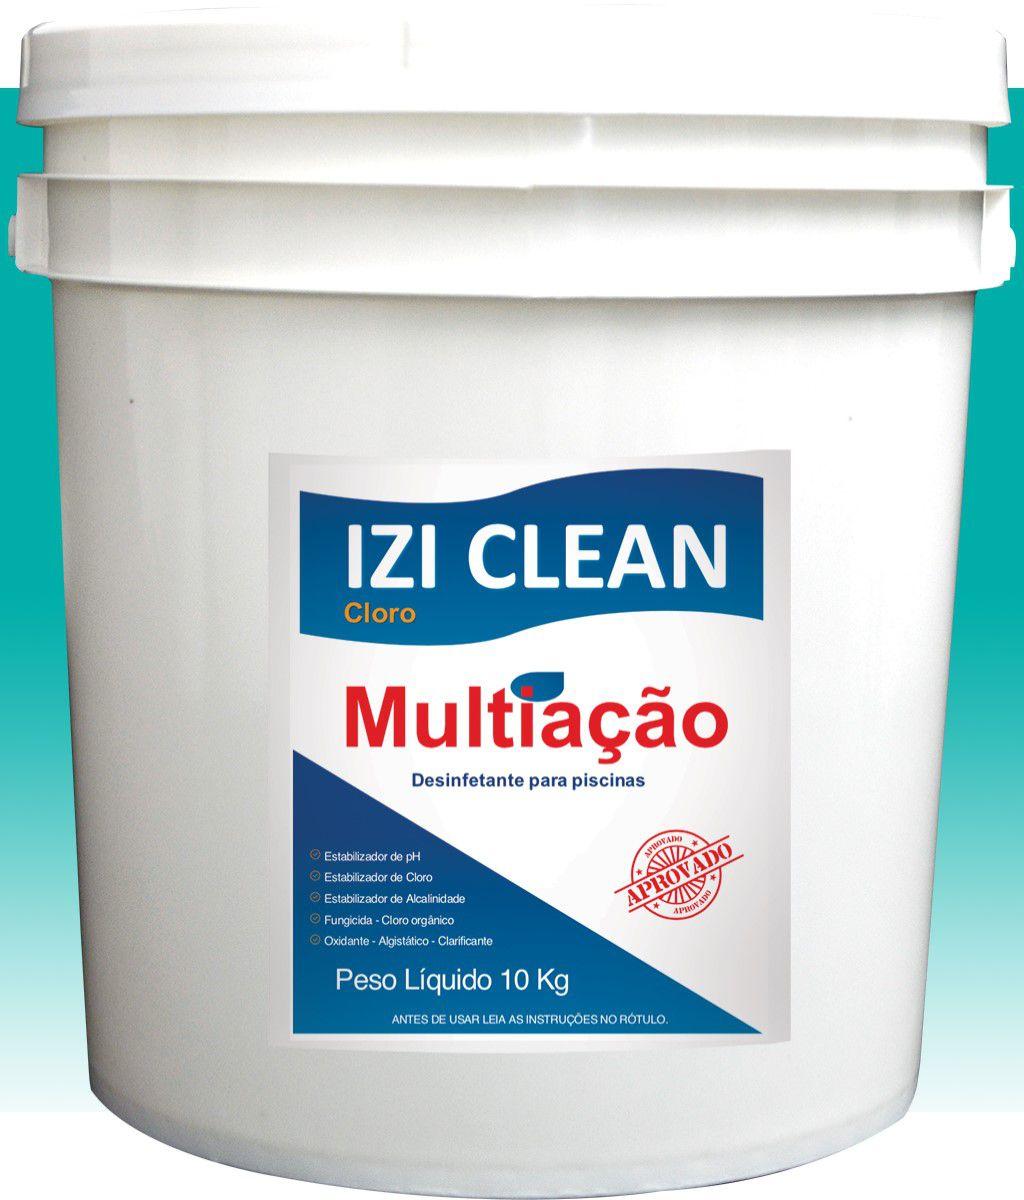 Dicloro Granulado - IZI CLEAN - 10 Kg, 5 Kg e 1 Kg